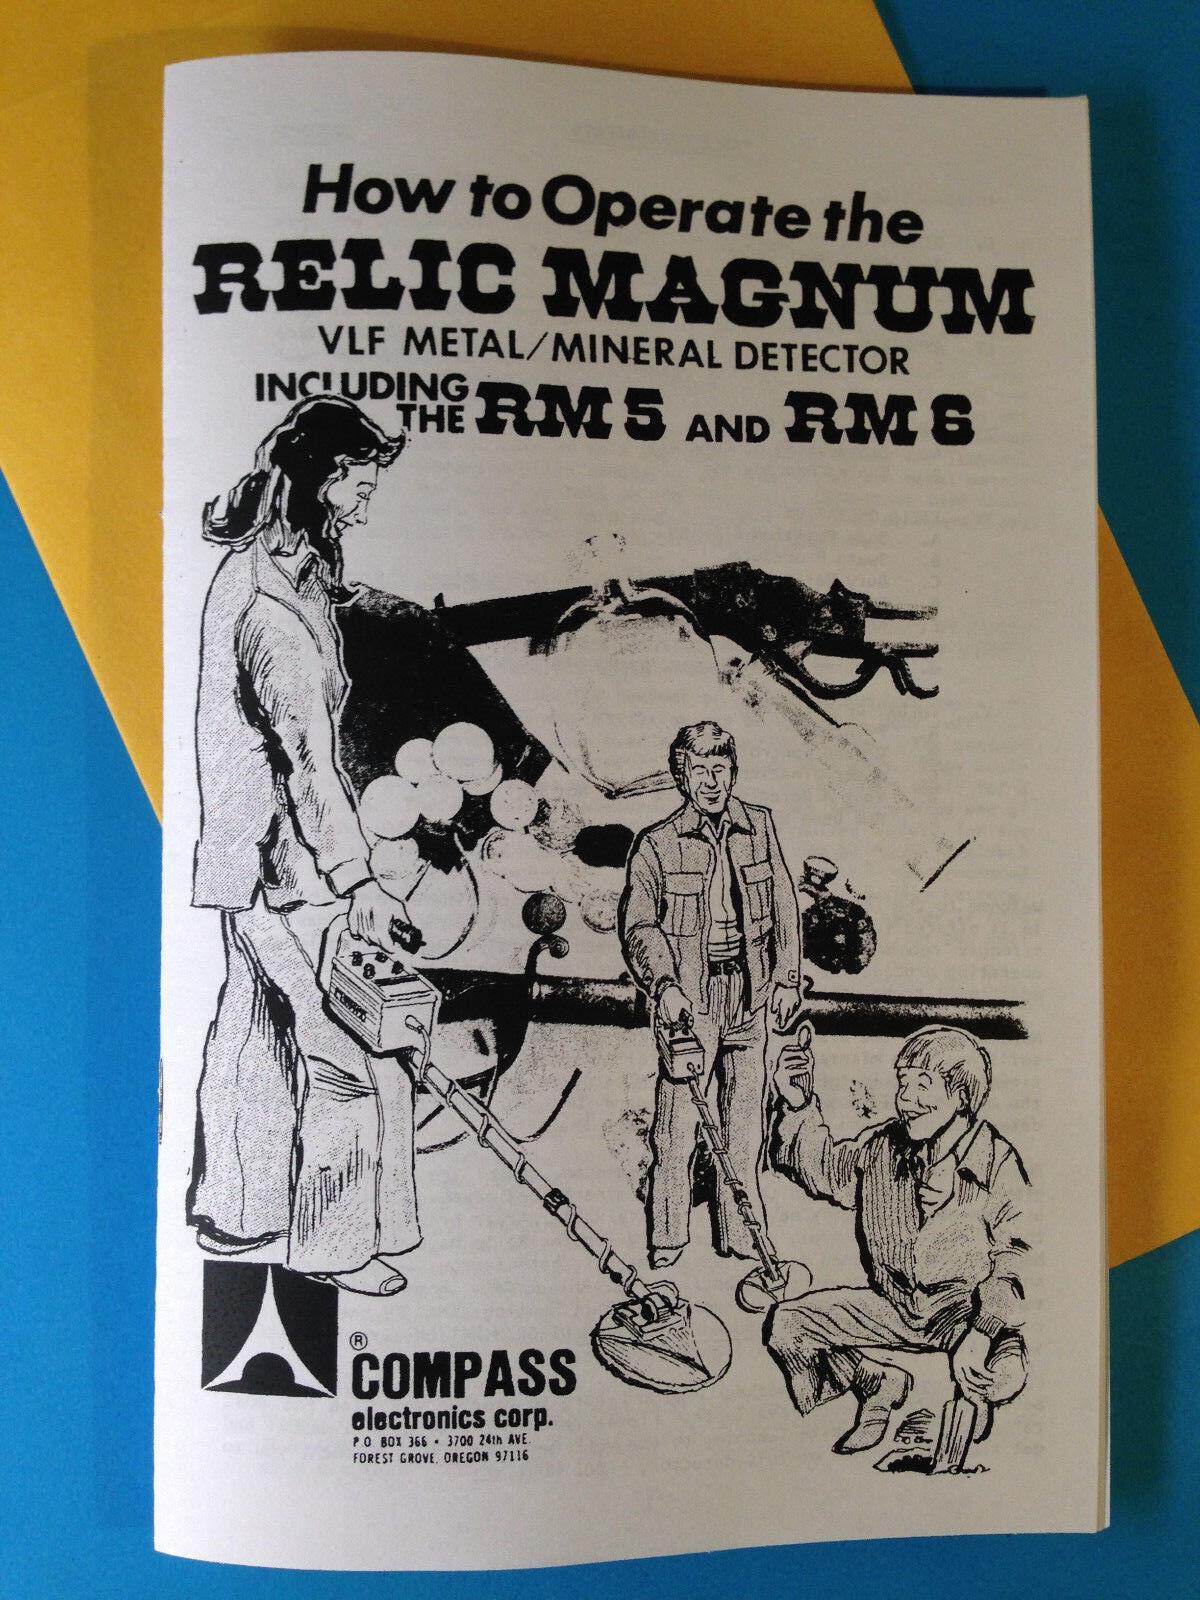 Compass Metal Detector Operation Manual Relic Magnum & RM5 RM6 Get Lost Treasure